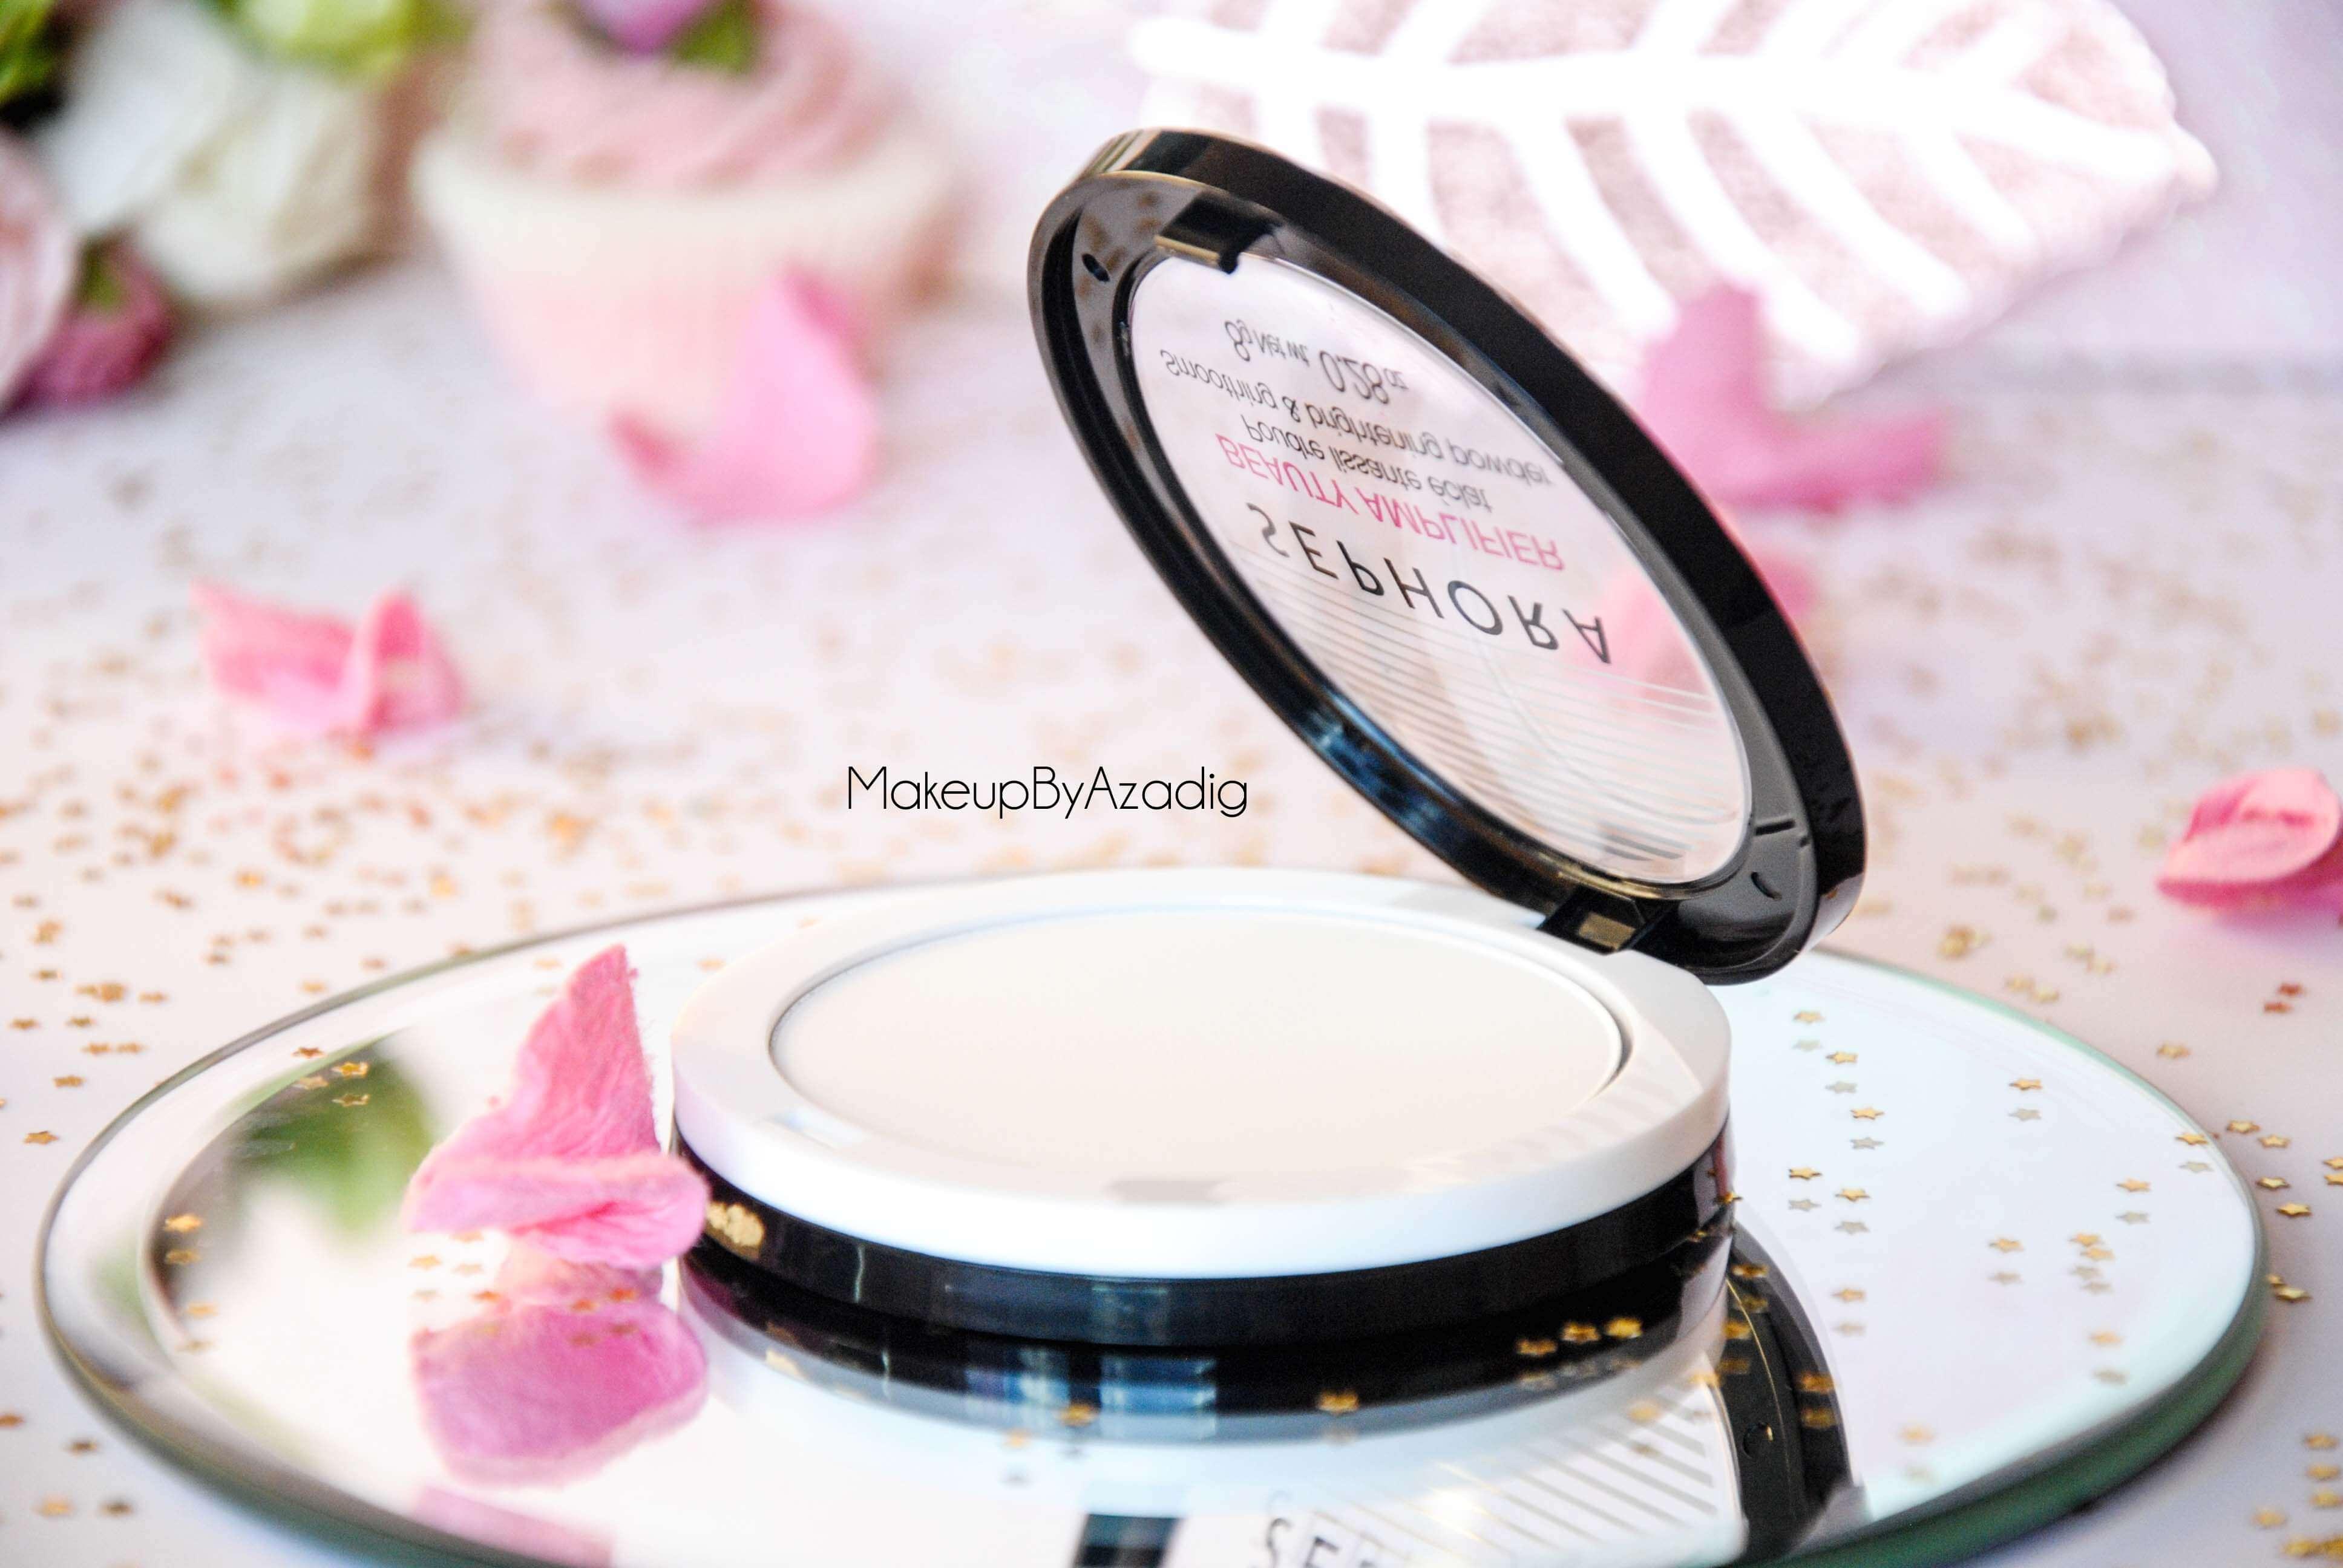 poudre-matifiante-beauty-amplifier-sephora-paris-makeupbyazadig-troyes-revue-avis-prix-blanche